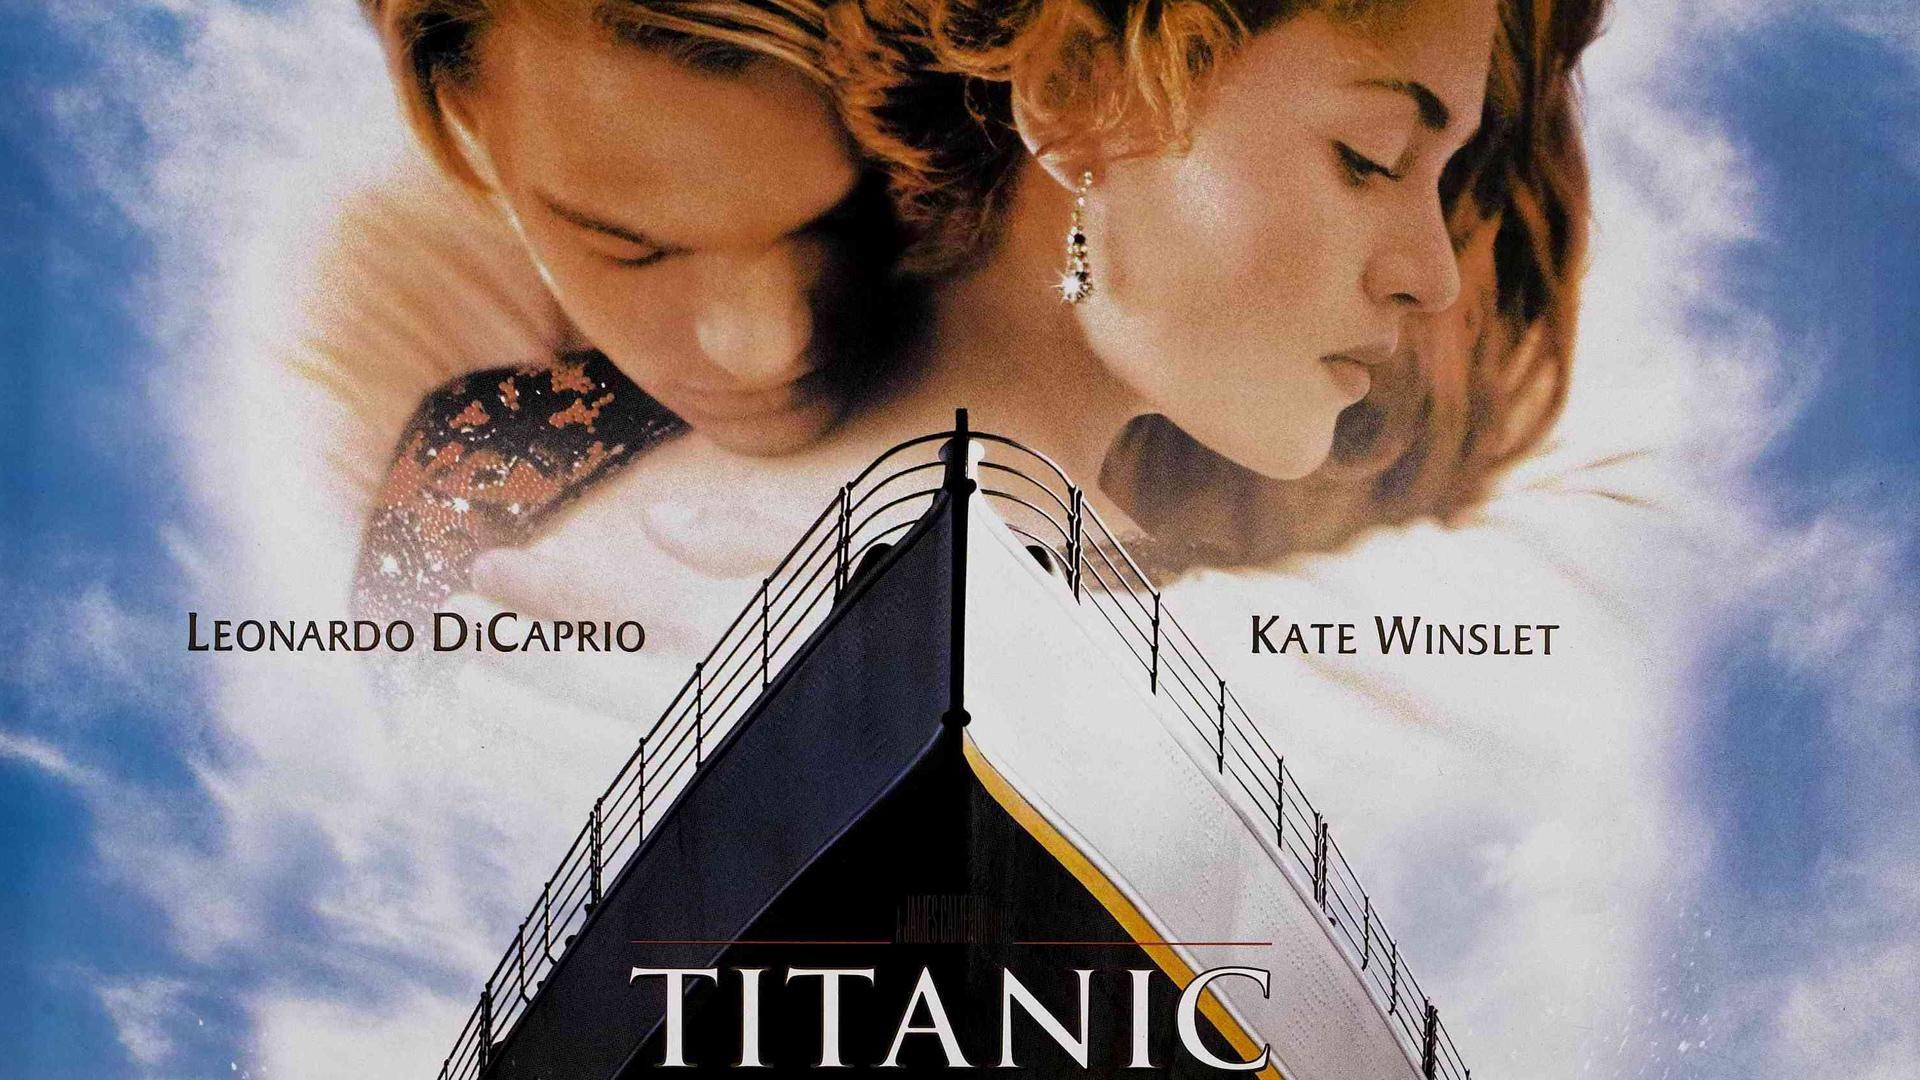 image - titanic hd banner | james cameron's titanic wiki